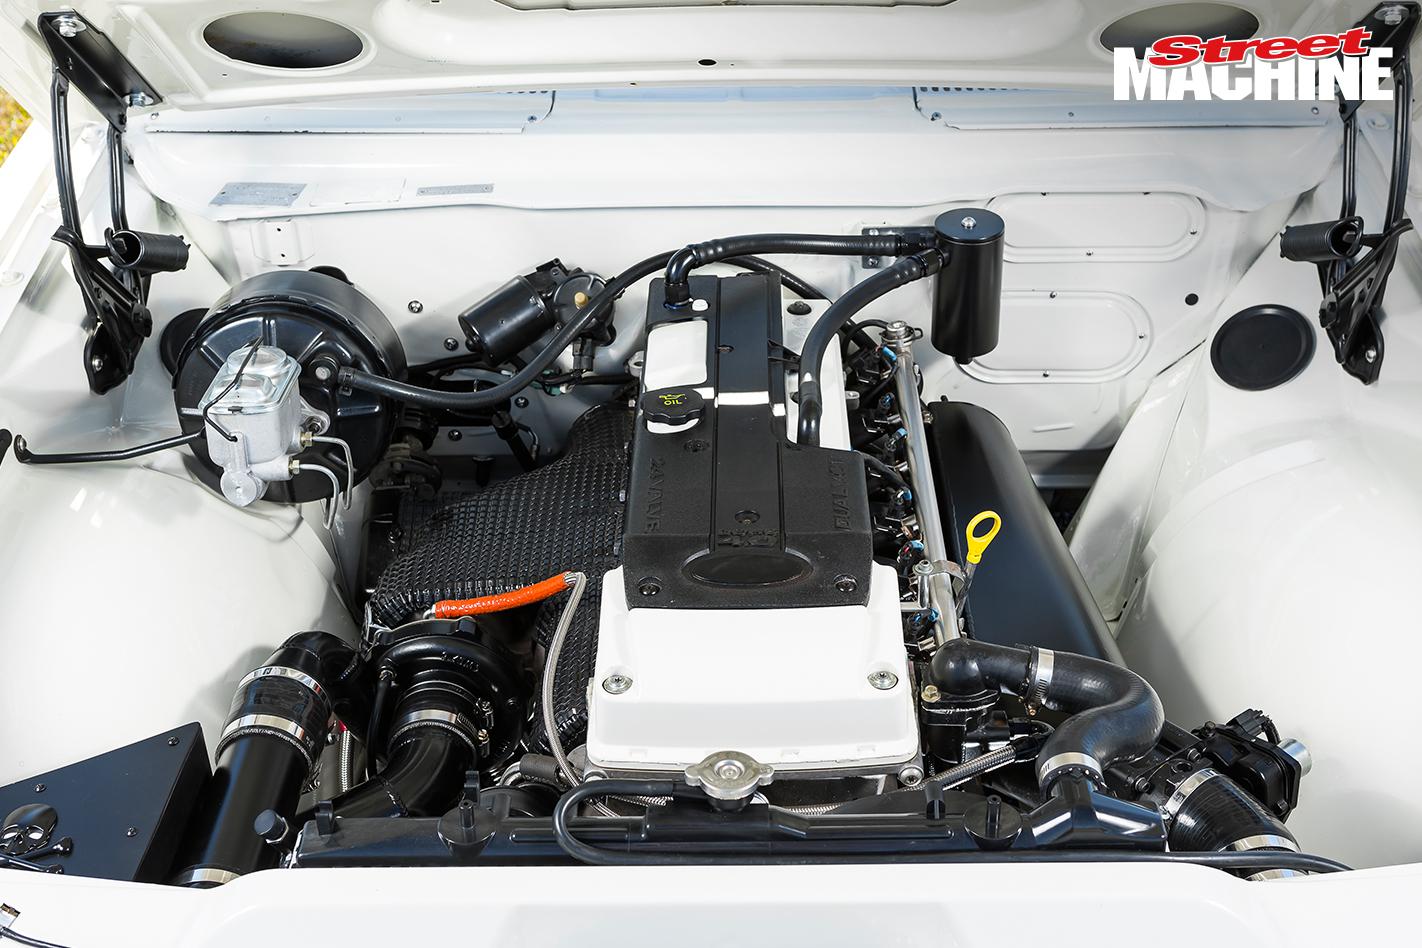 HG Holden Belmont Barra Turbo Engine 1